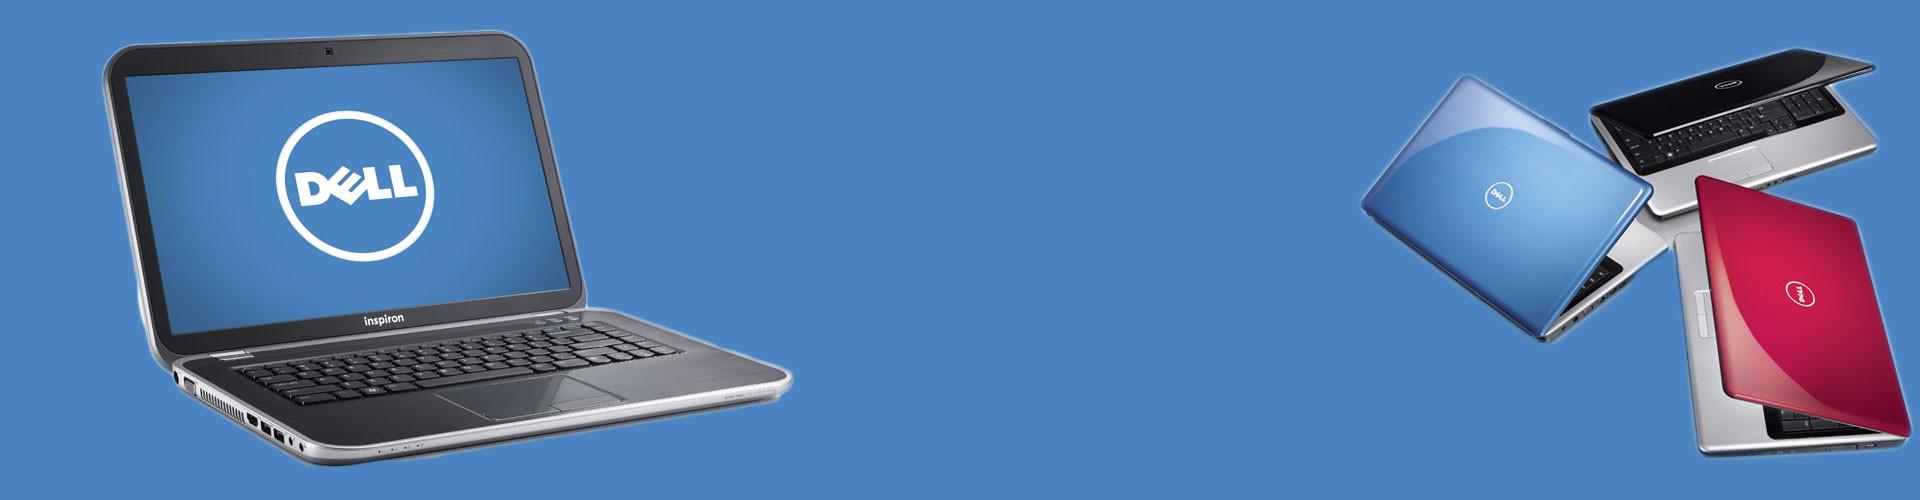 لپ تاپ دست دوم / لپ تاپ استوک فروش انواع لپ تاپ استوک اروپایی گرید A